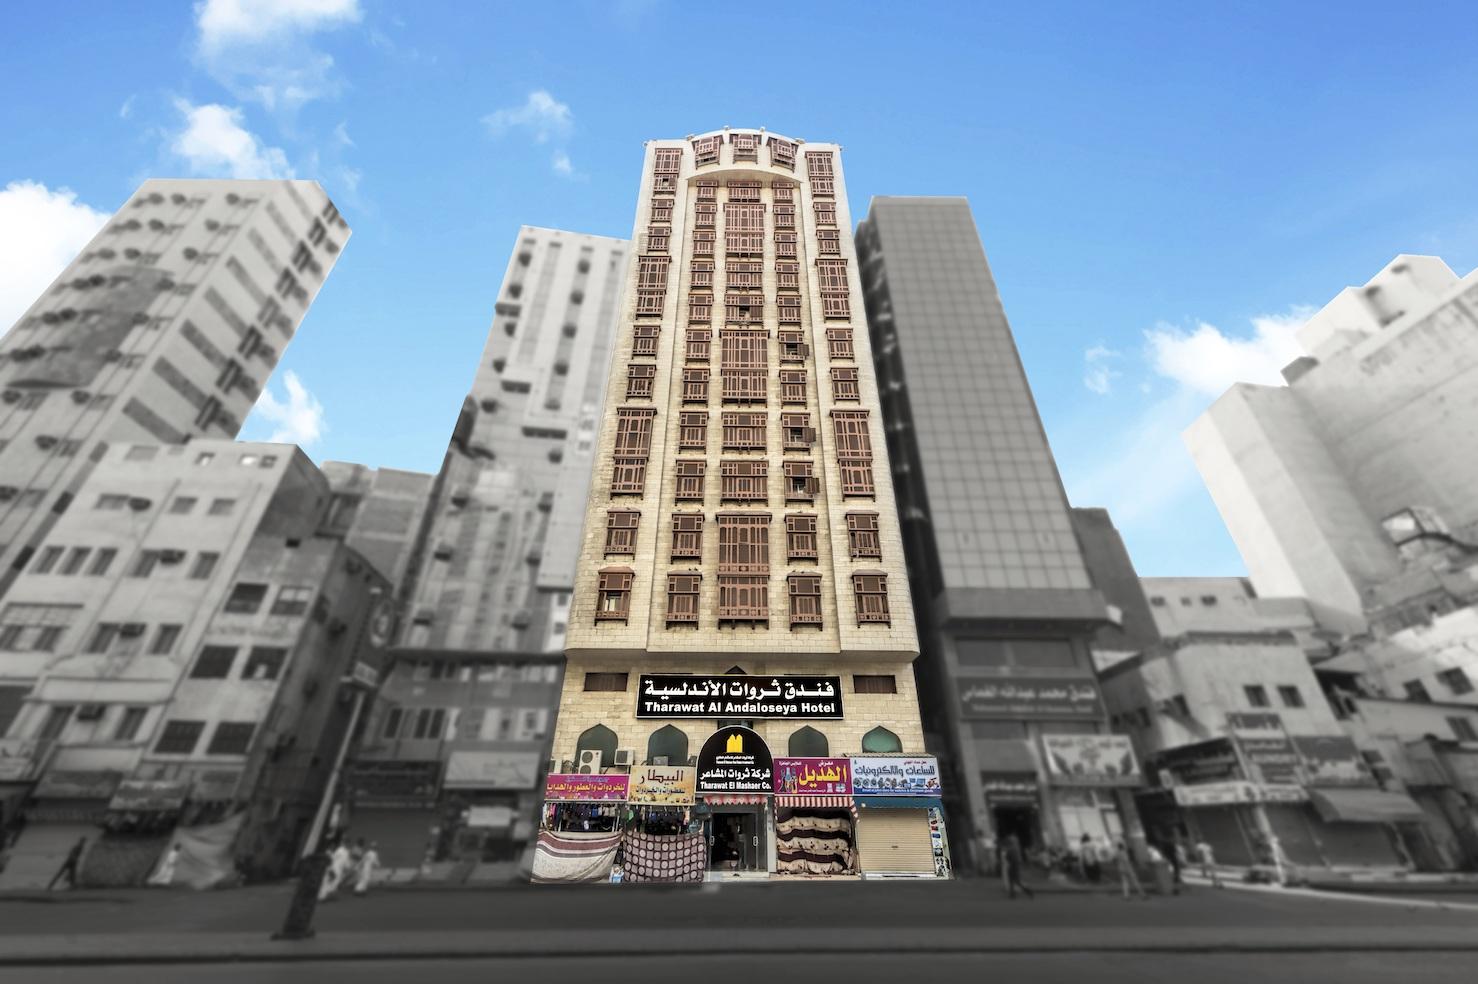 Tharawat-Al-Andaloseya-Hotel